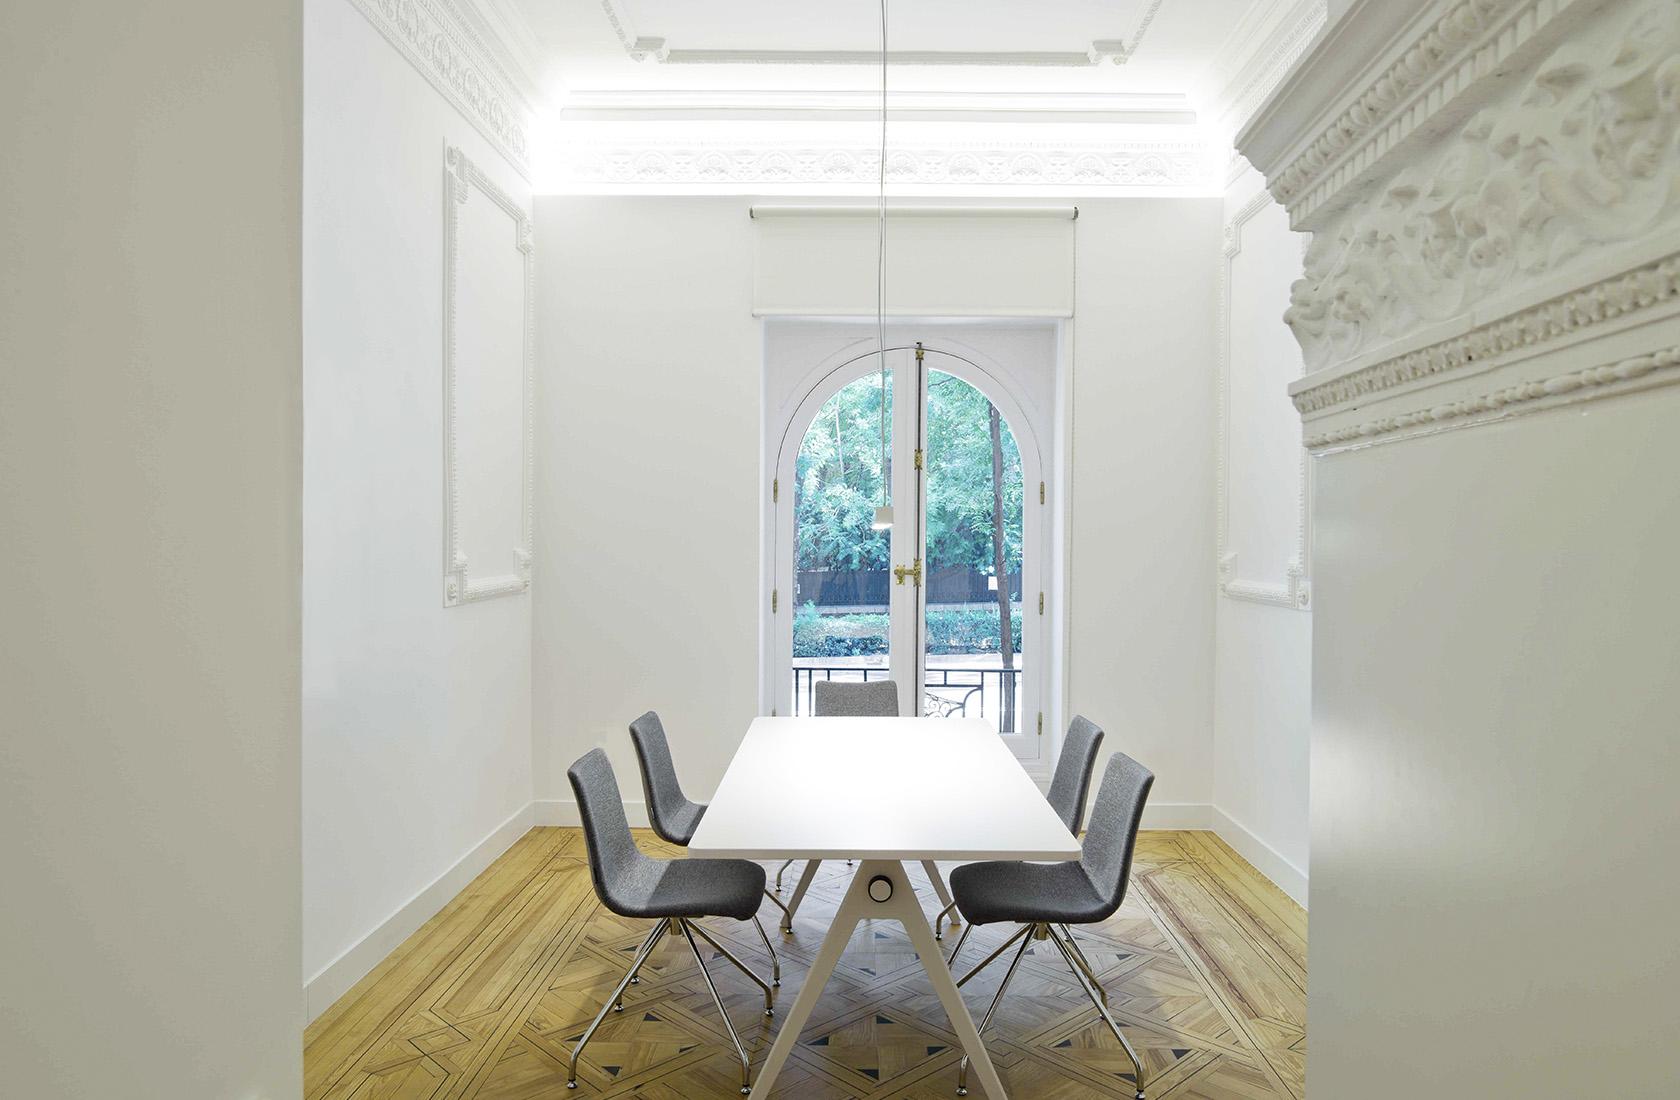 sala de reuniones de la oficina ed